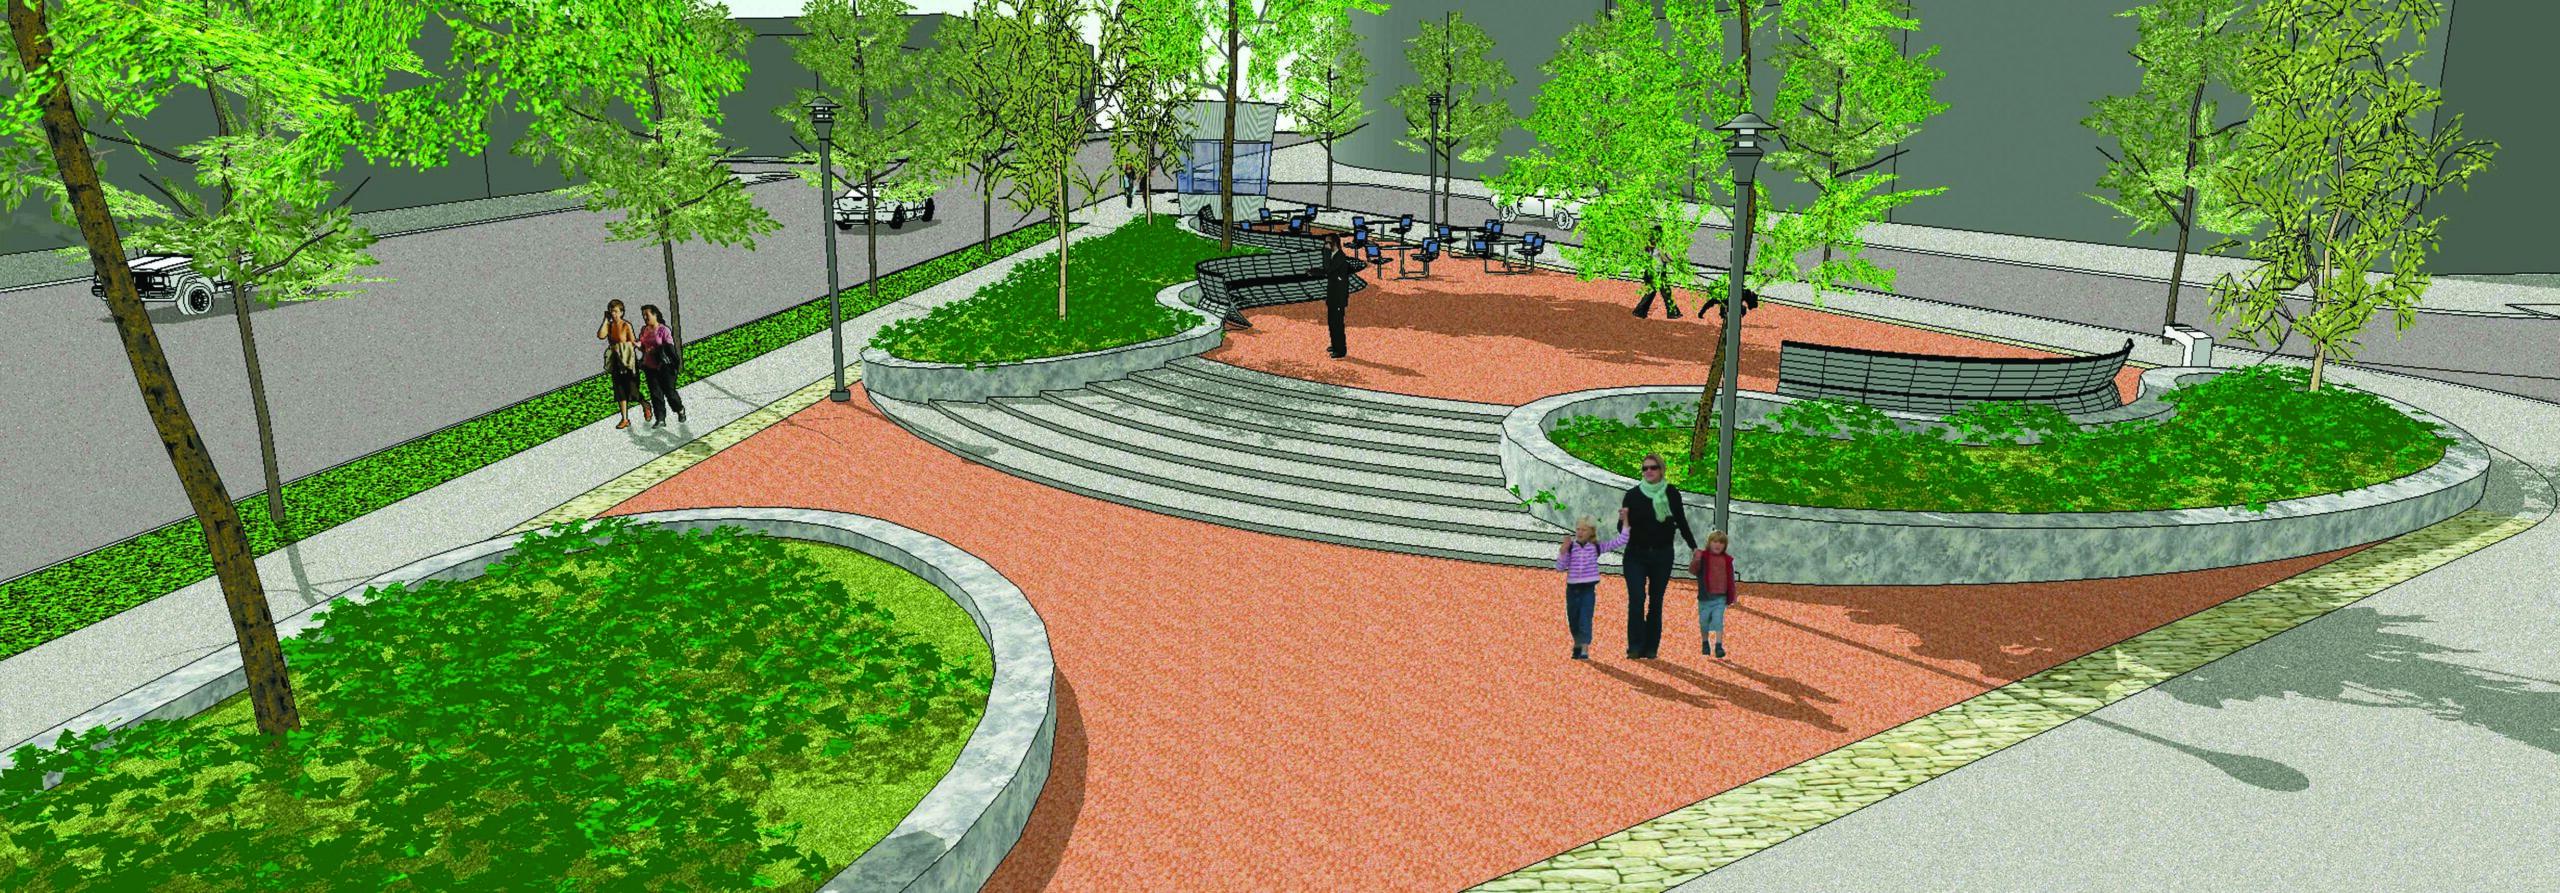 Bryan Park/Fordham-Kingsbridge Plaza